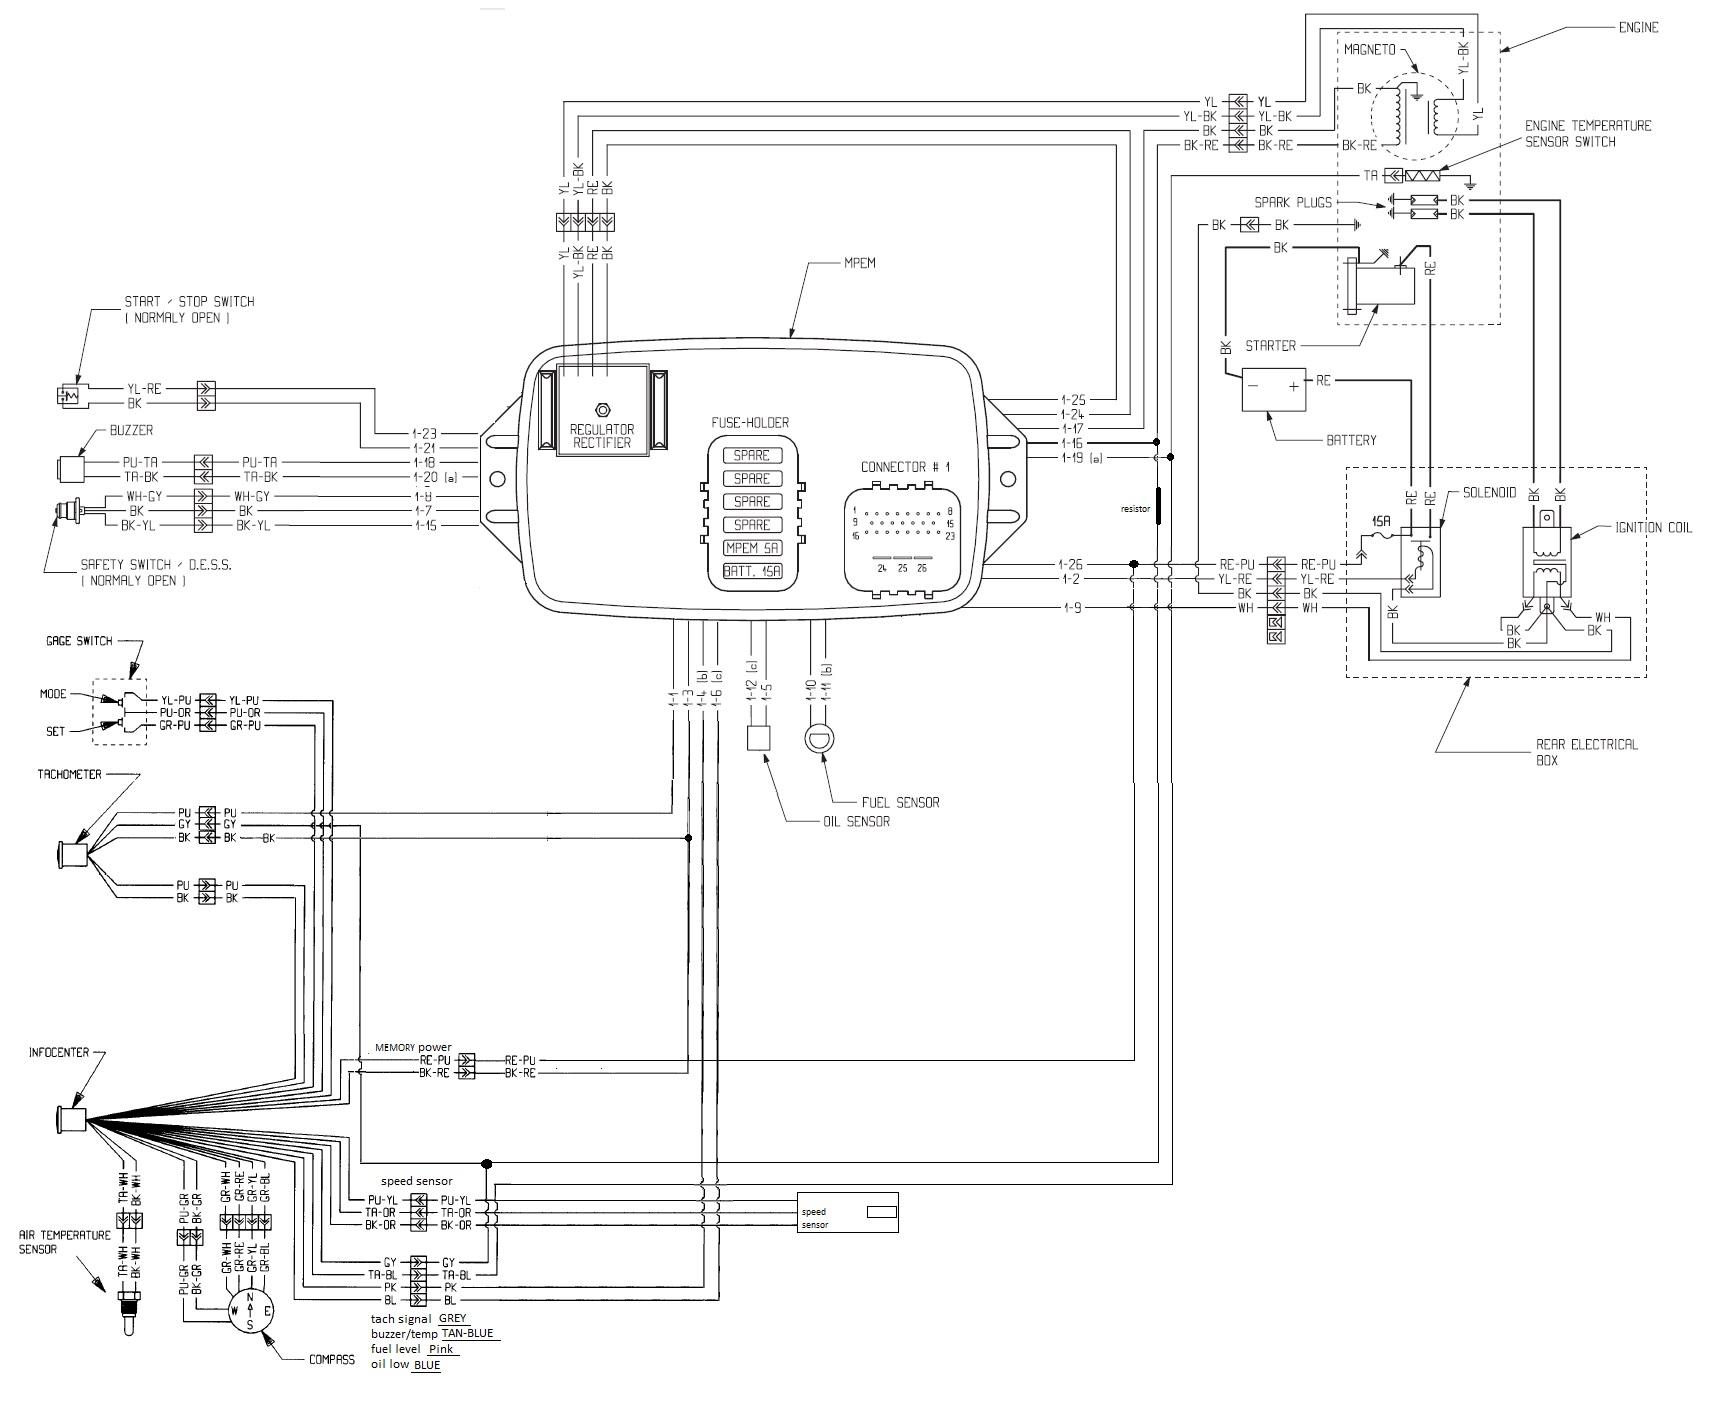 ta 2000 wiring diagram ta wiring diagrams photos g l fallout wiring diagram diagram